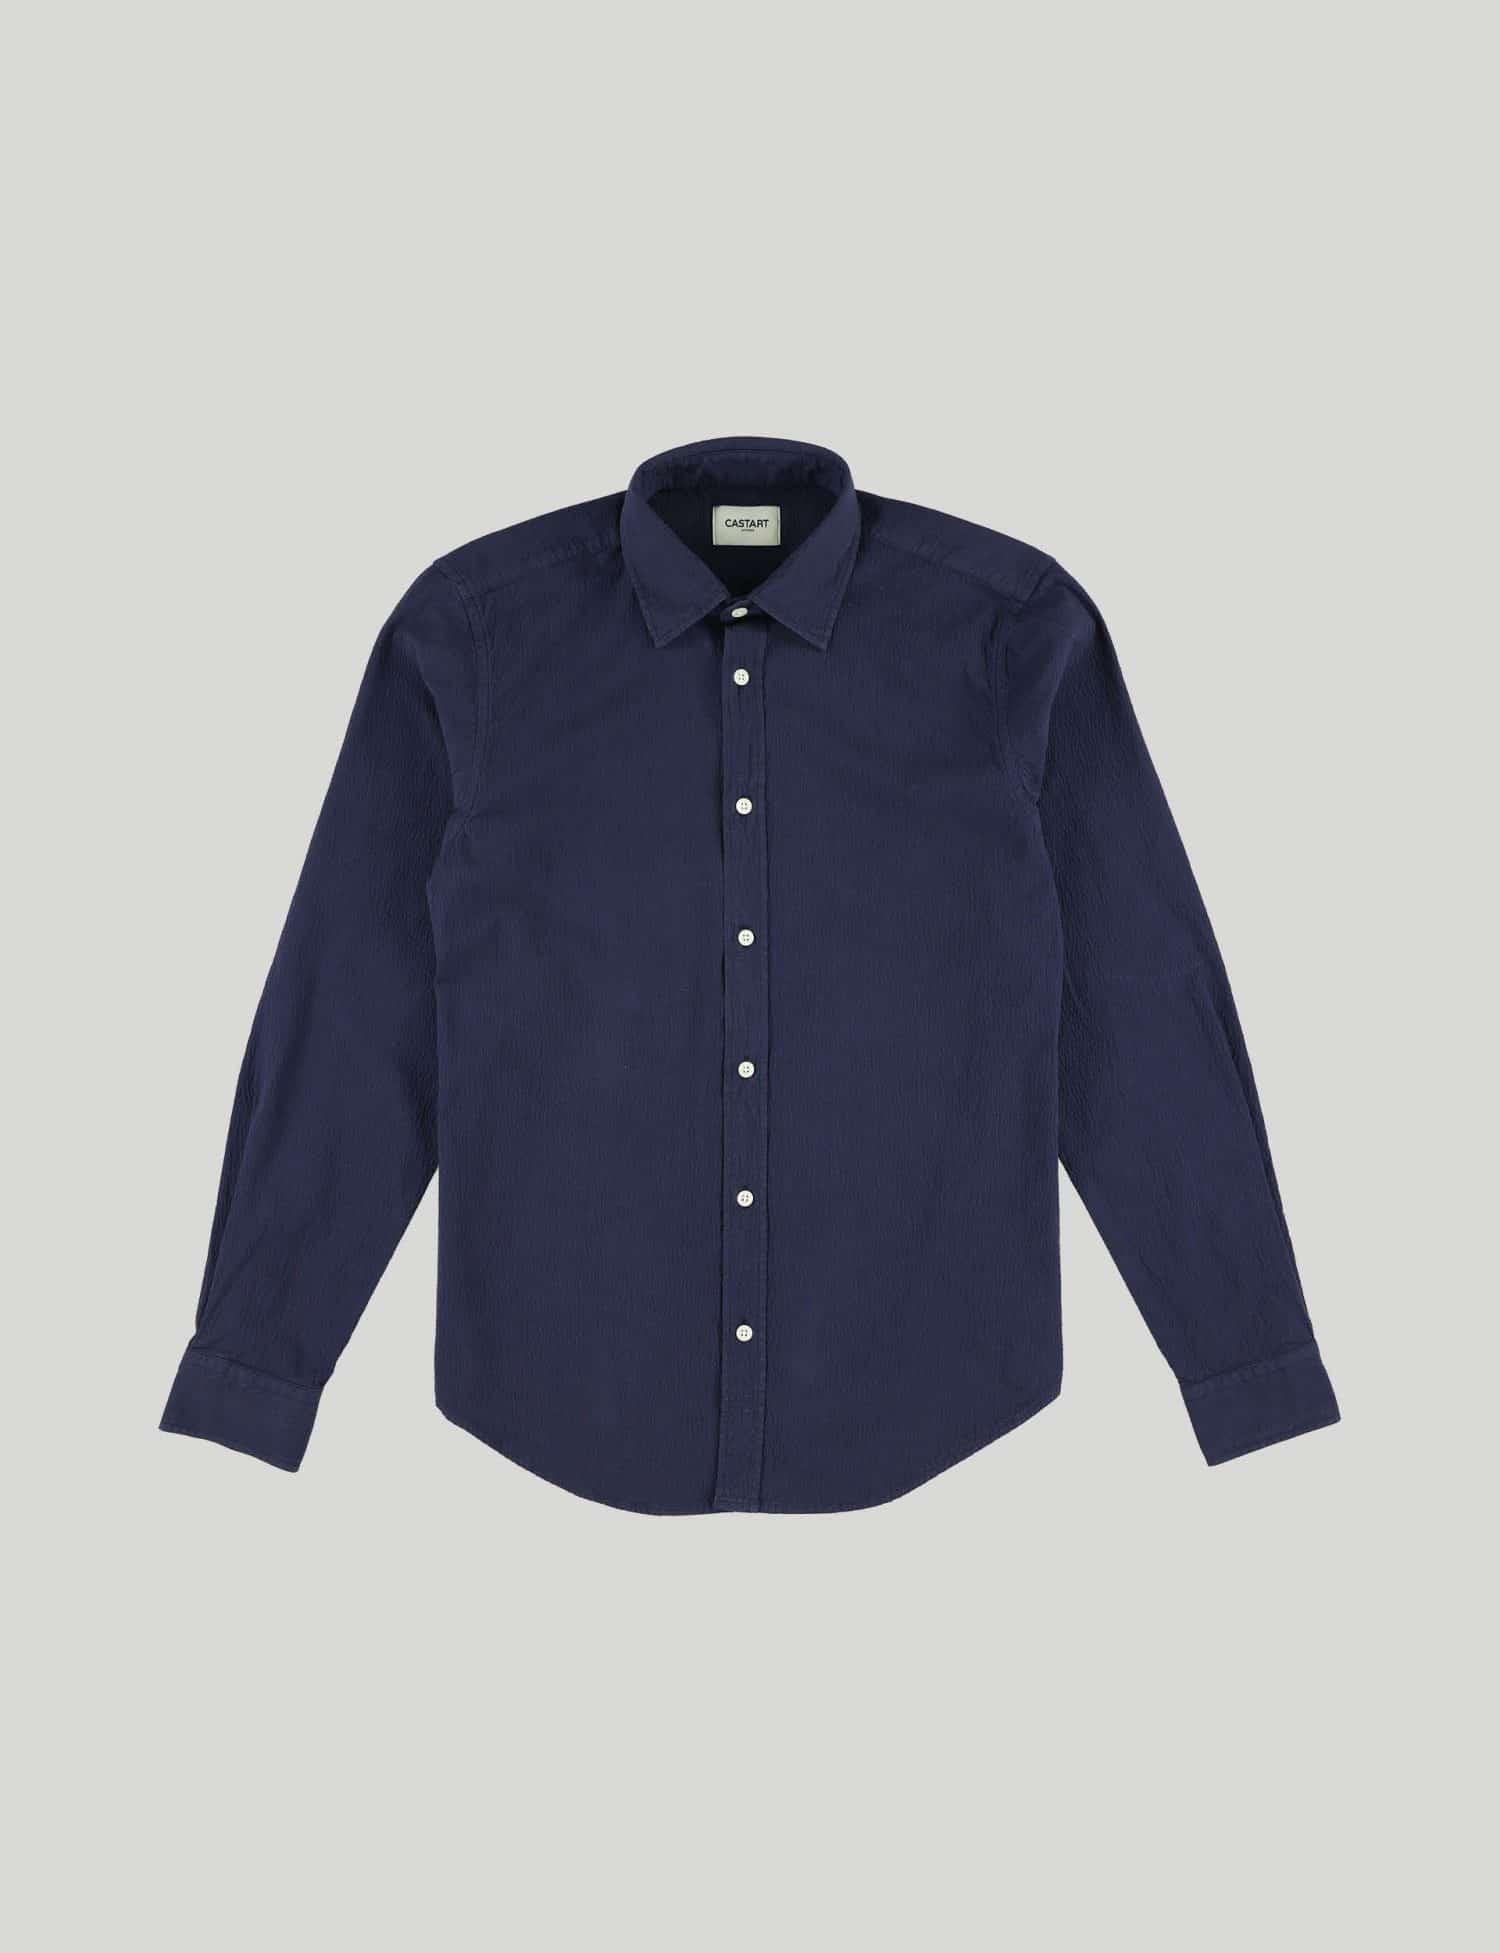 Castart - Tiger Tooth LS Shirt - Navy Blue